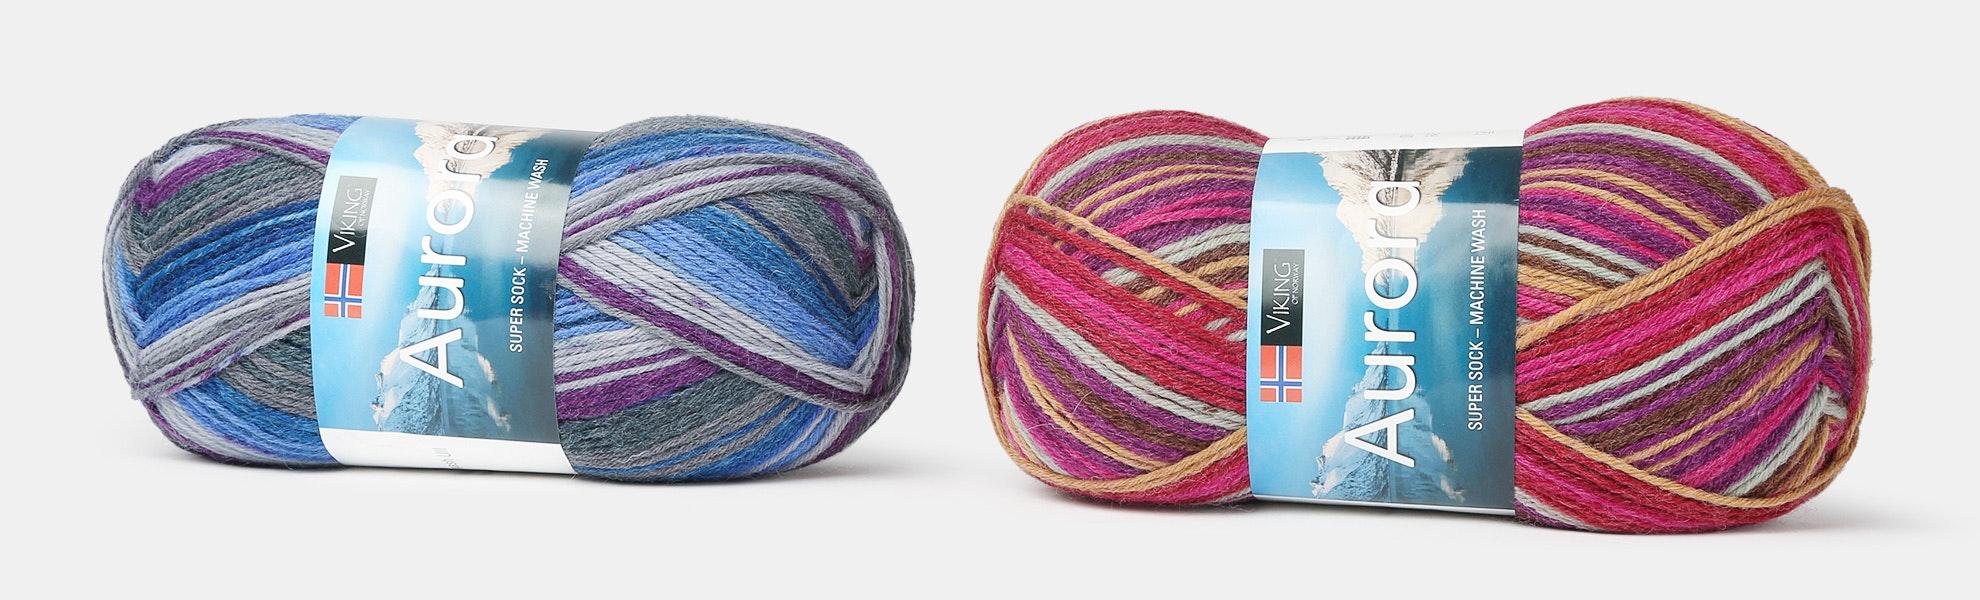 Aurora Yarn by Viking of Norway